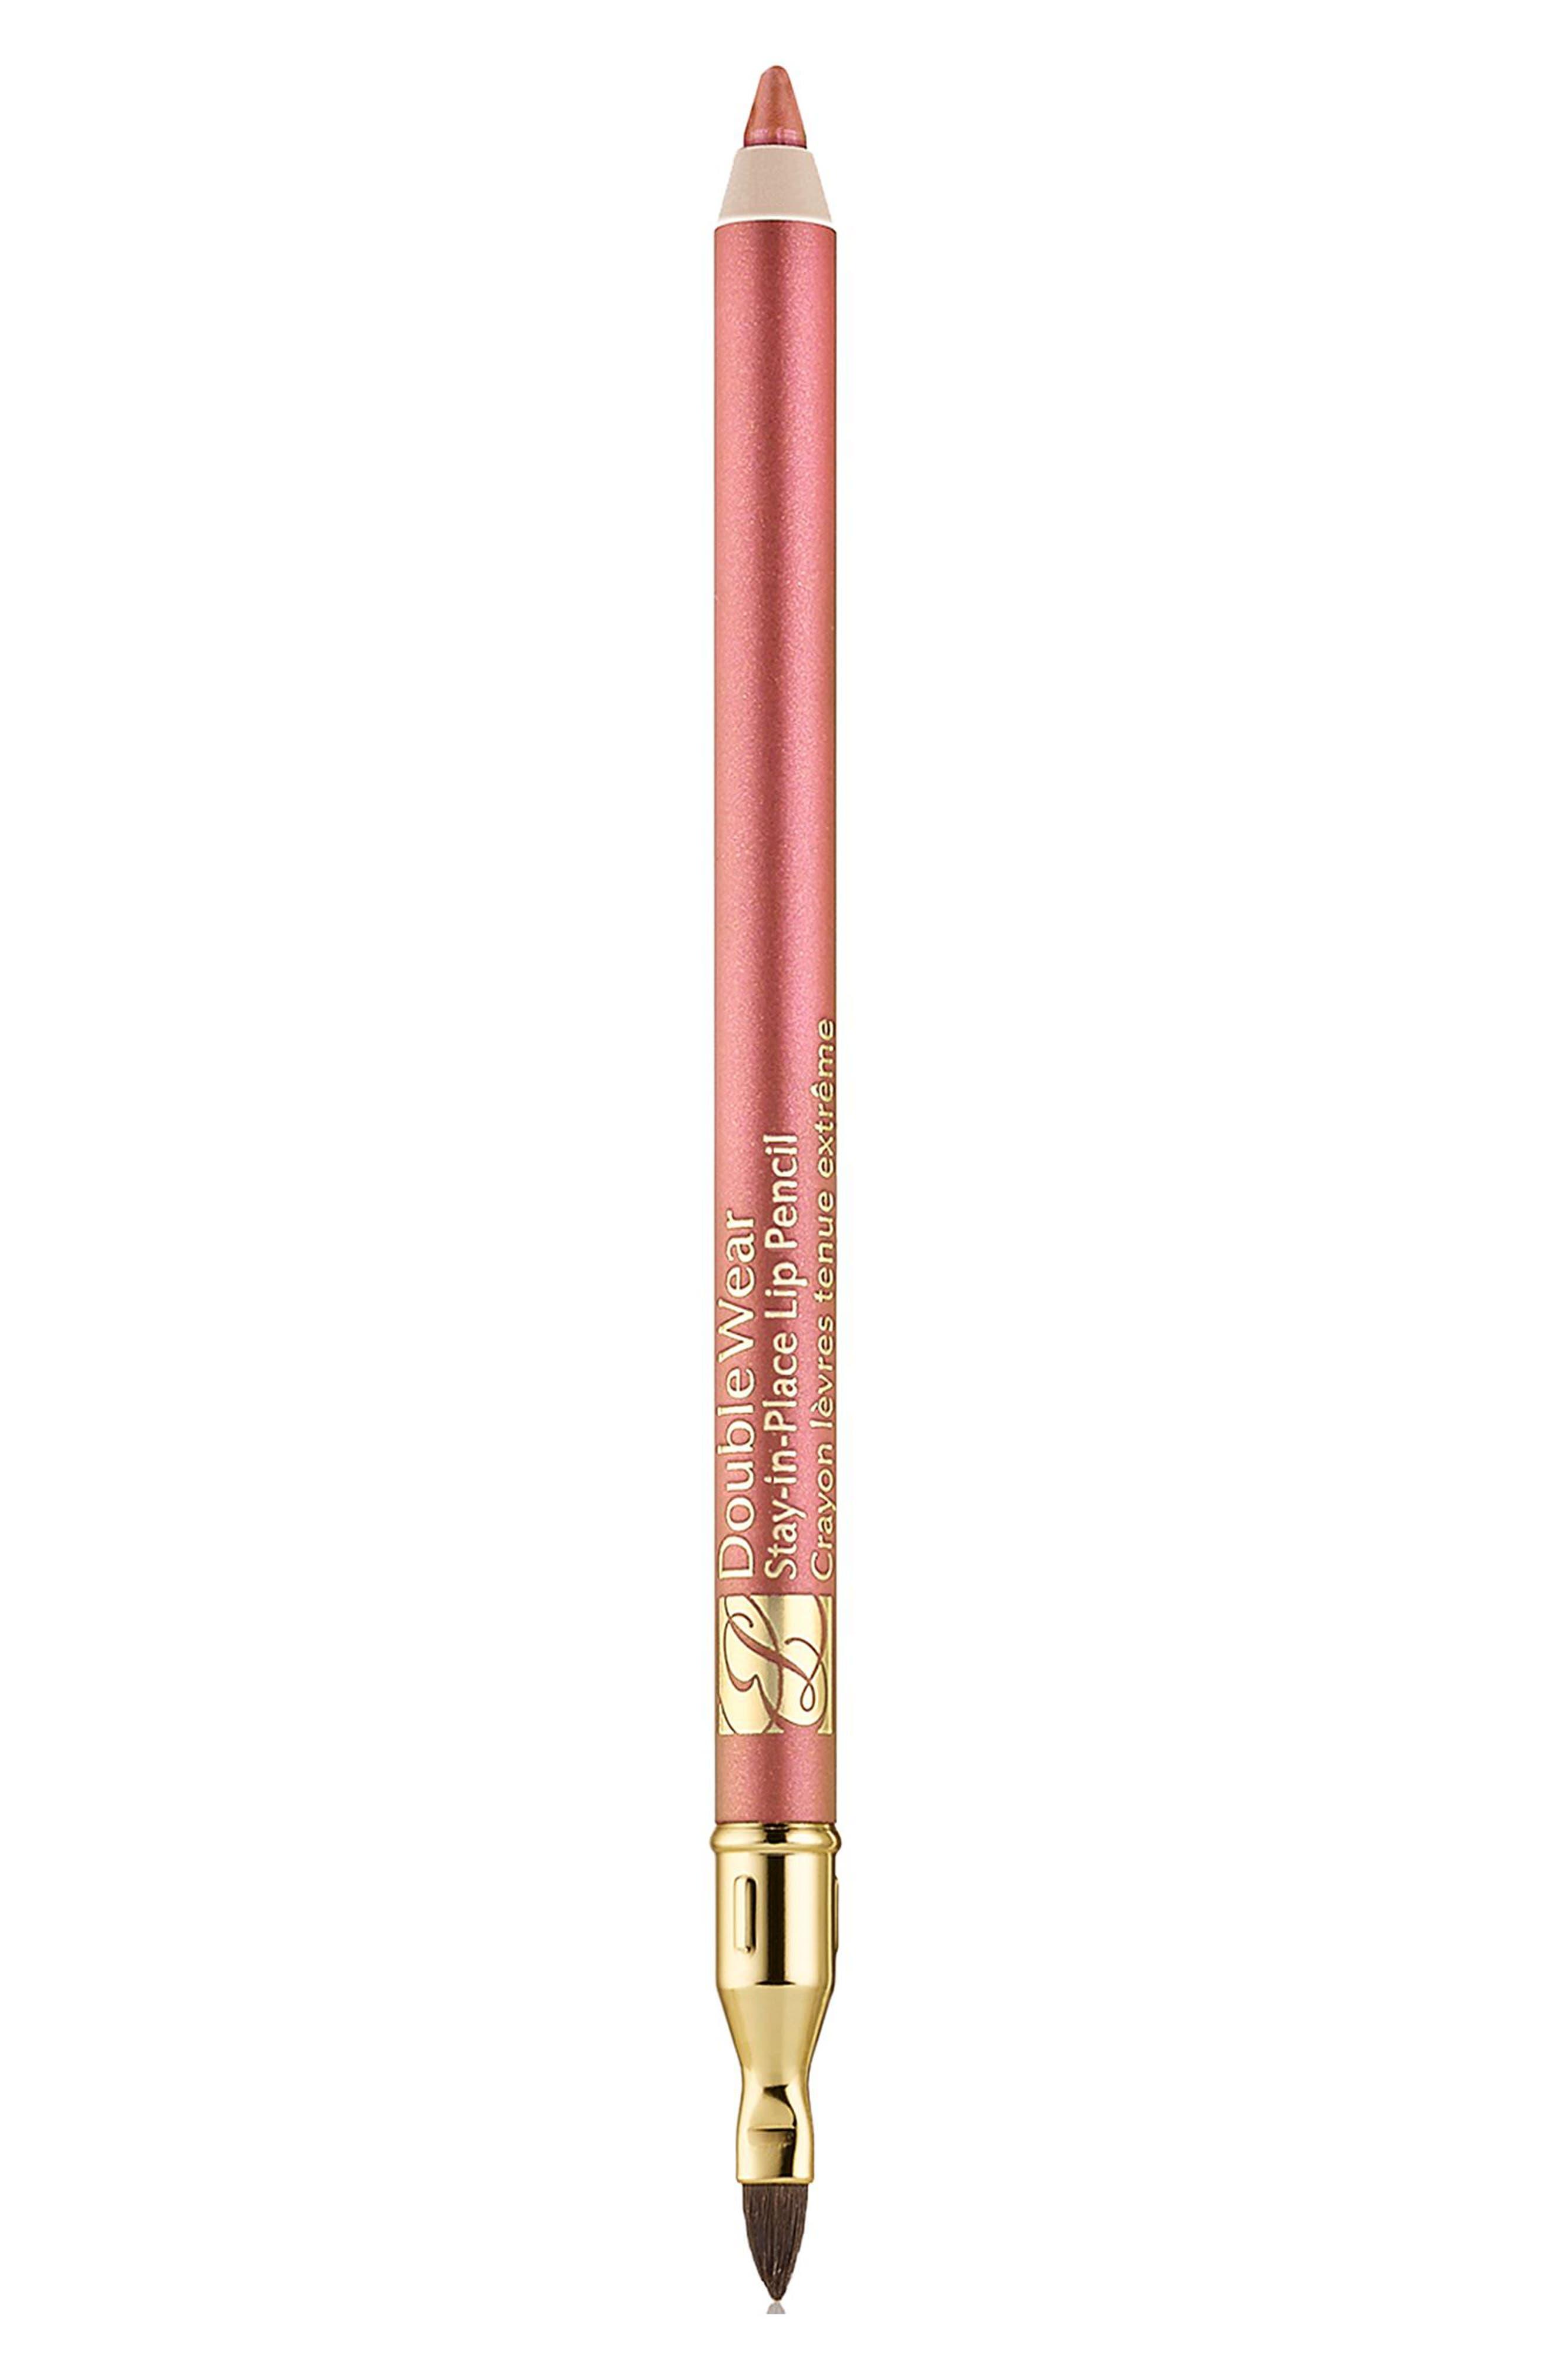 Estee Lauder Double Wear Stay-In-Place Lip Pencil - Tawny